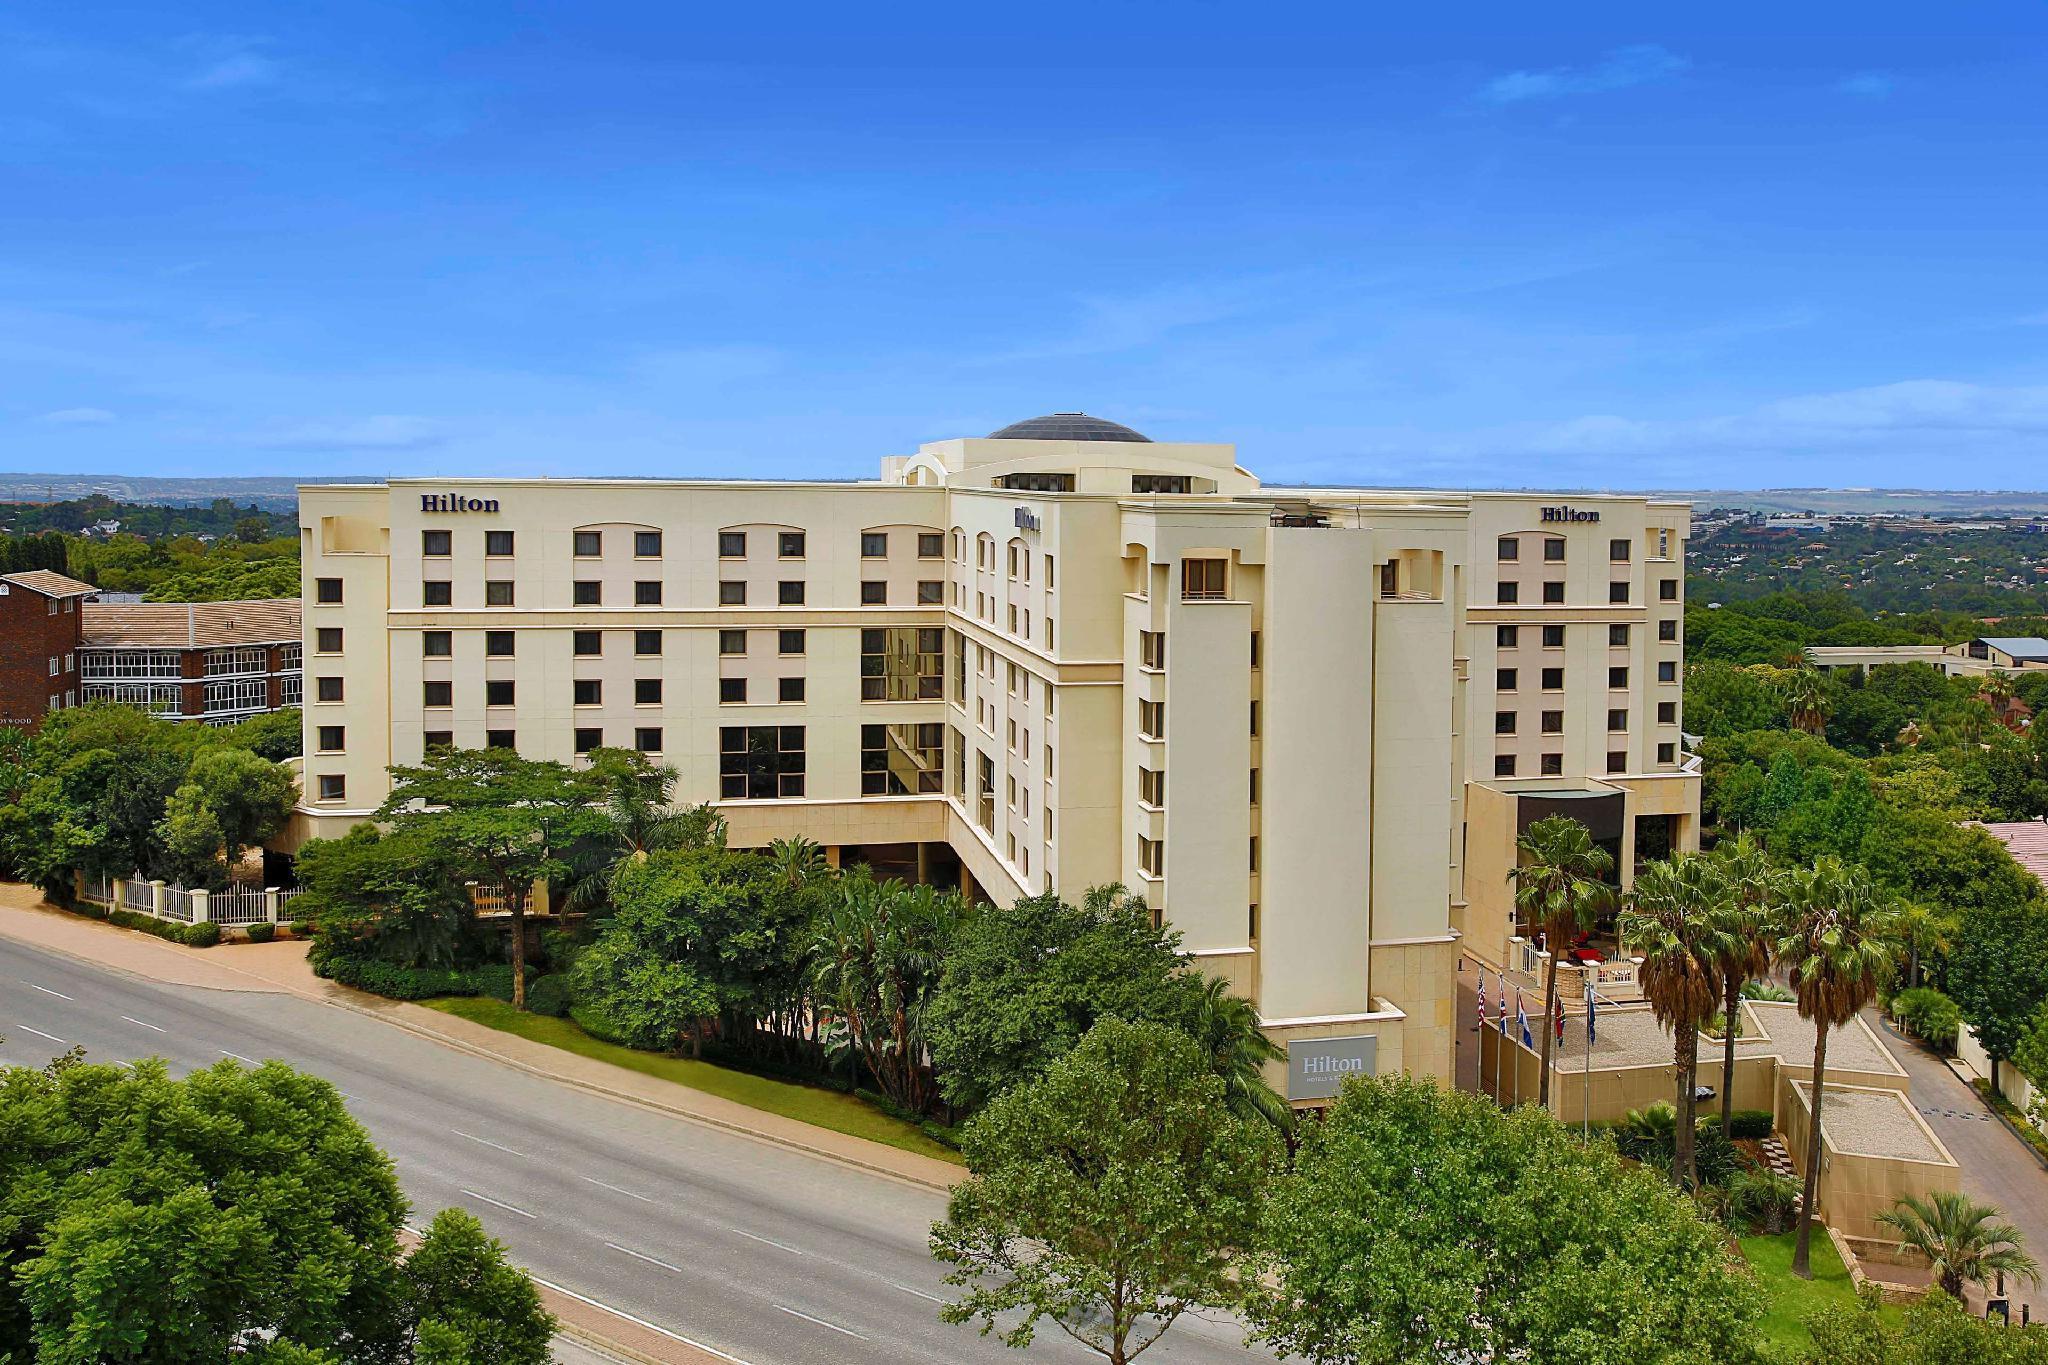 Hilton Sandton Hotel